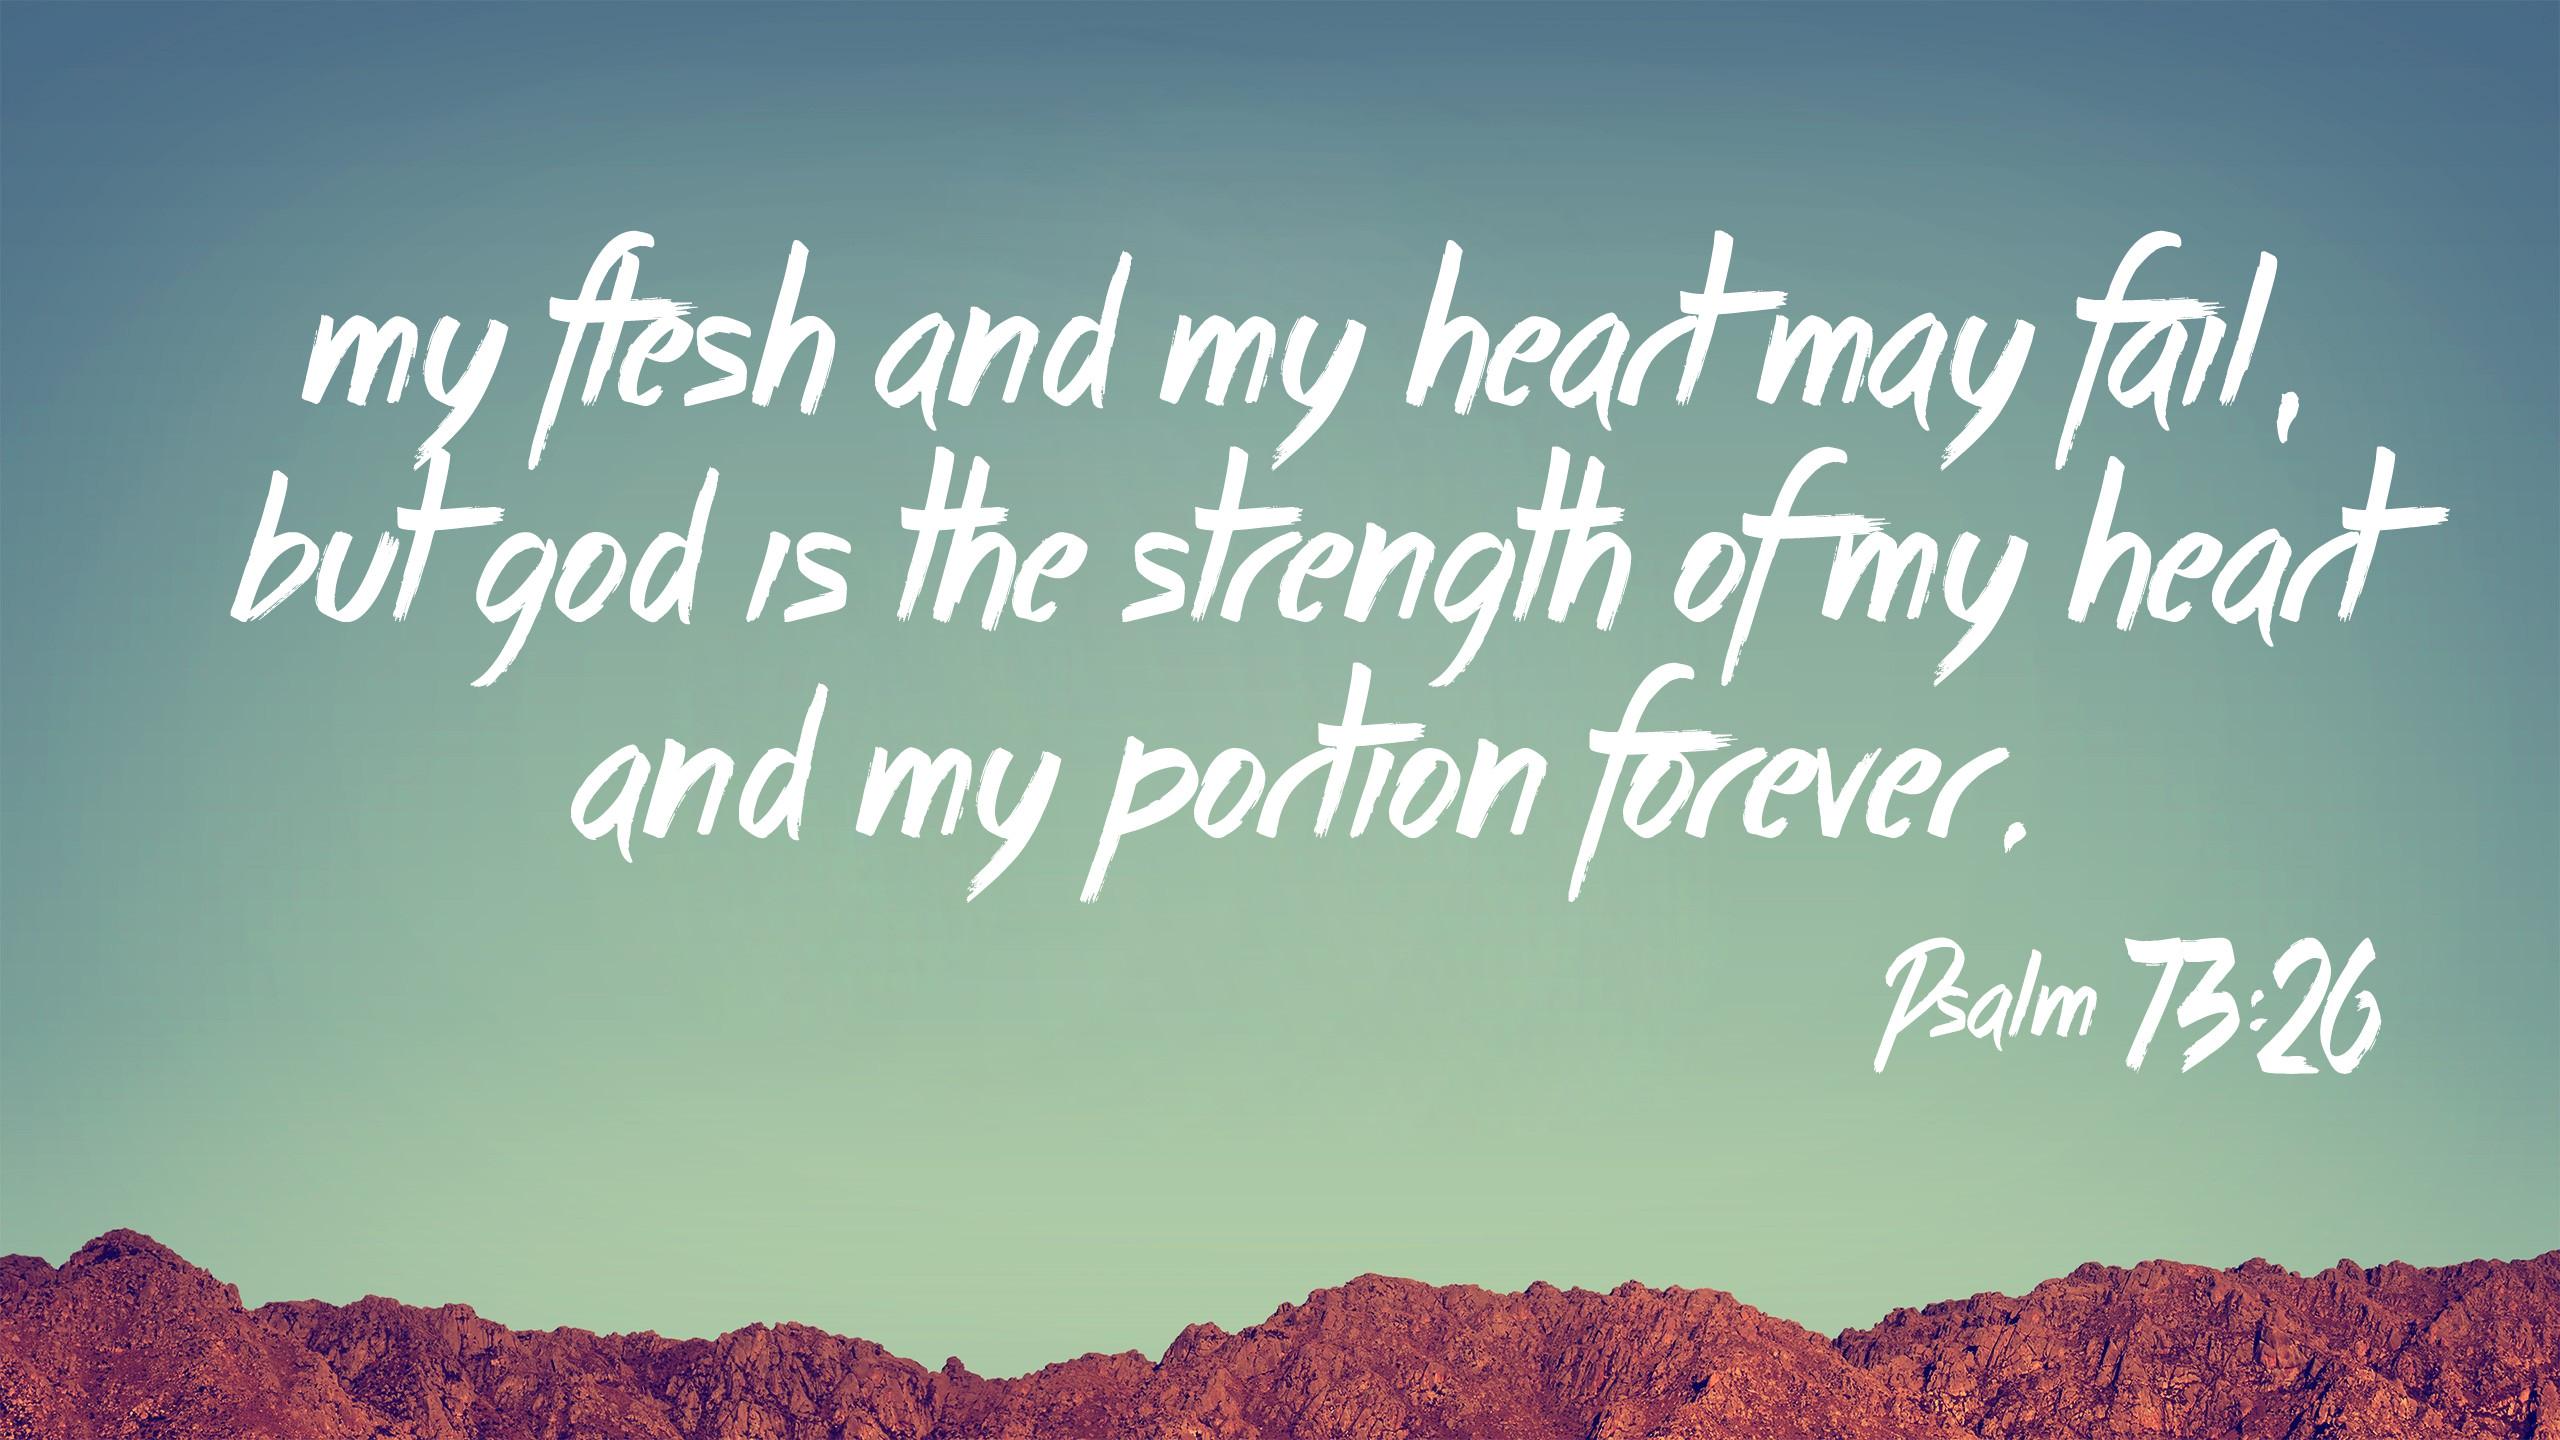 Inspirational Bible Quotes Desktop Wallpaper